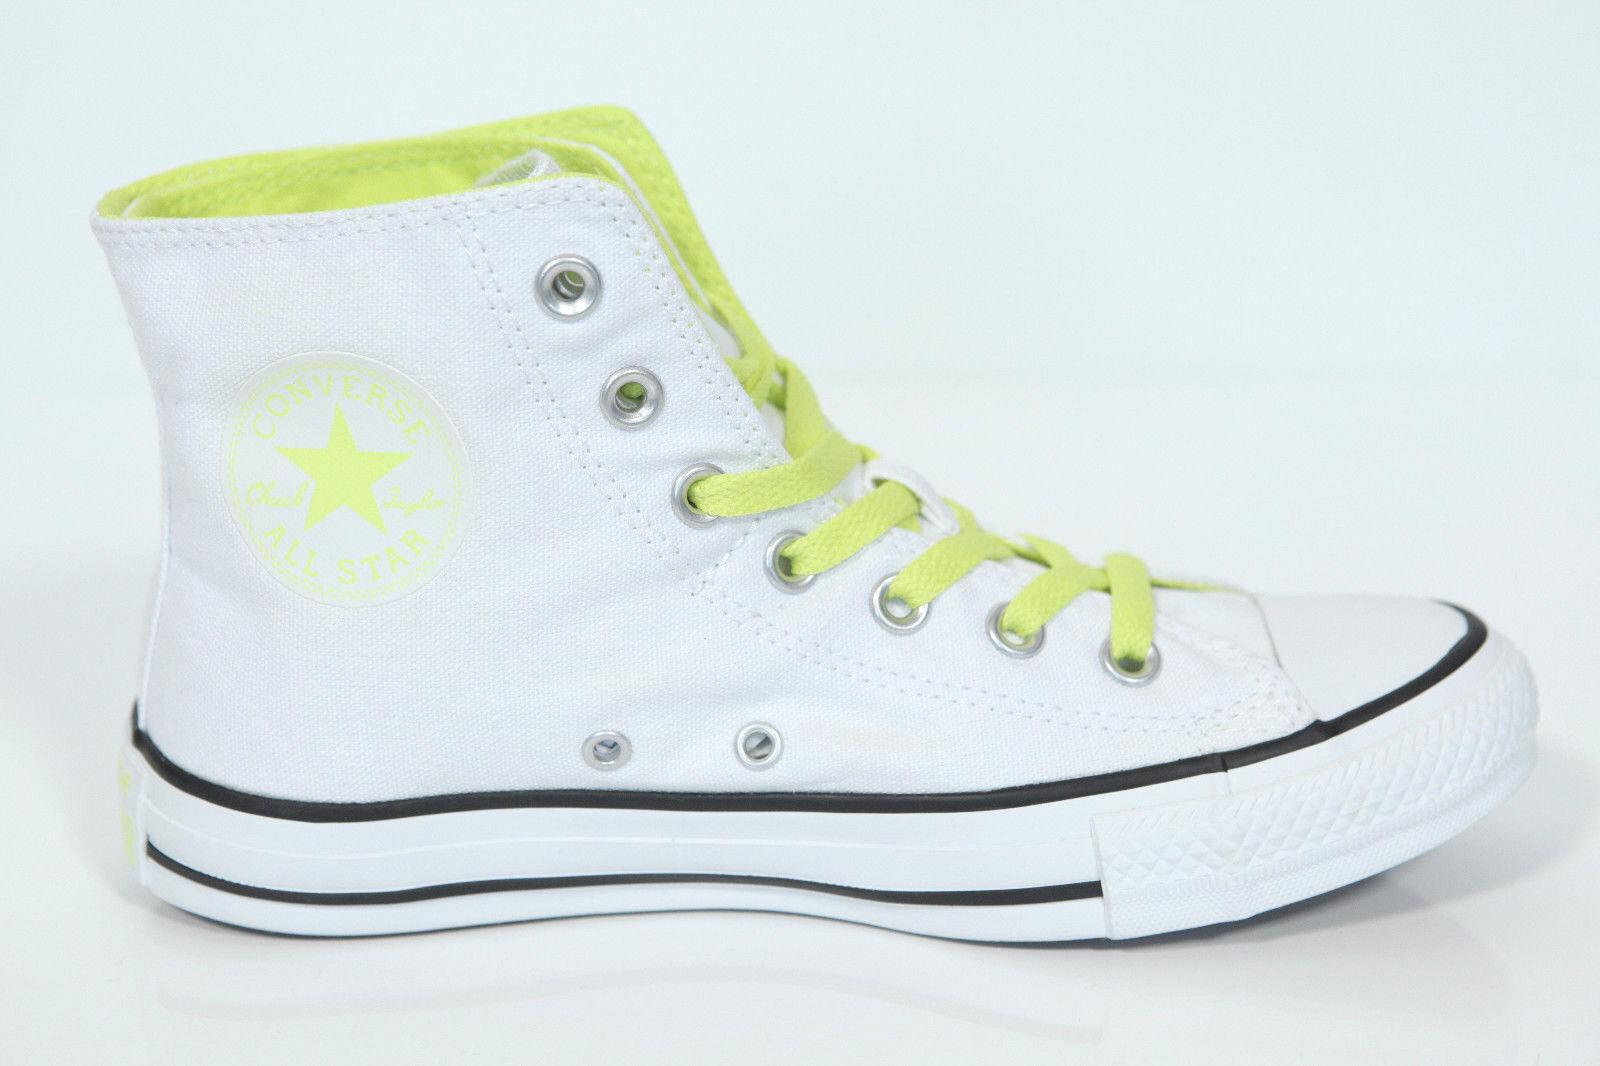 Neu All Star Converse Chucks Hi Two Fold weiß citron Sneaker 542590c Retro